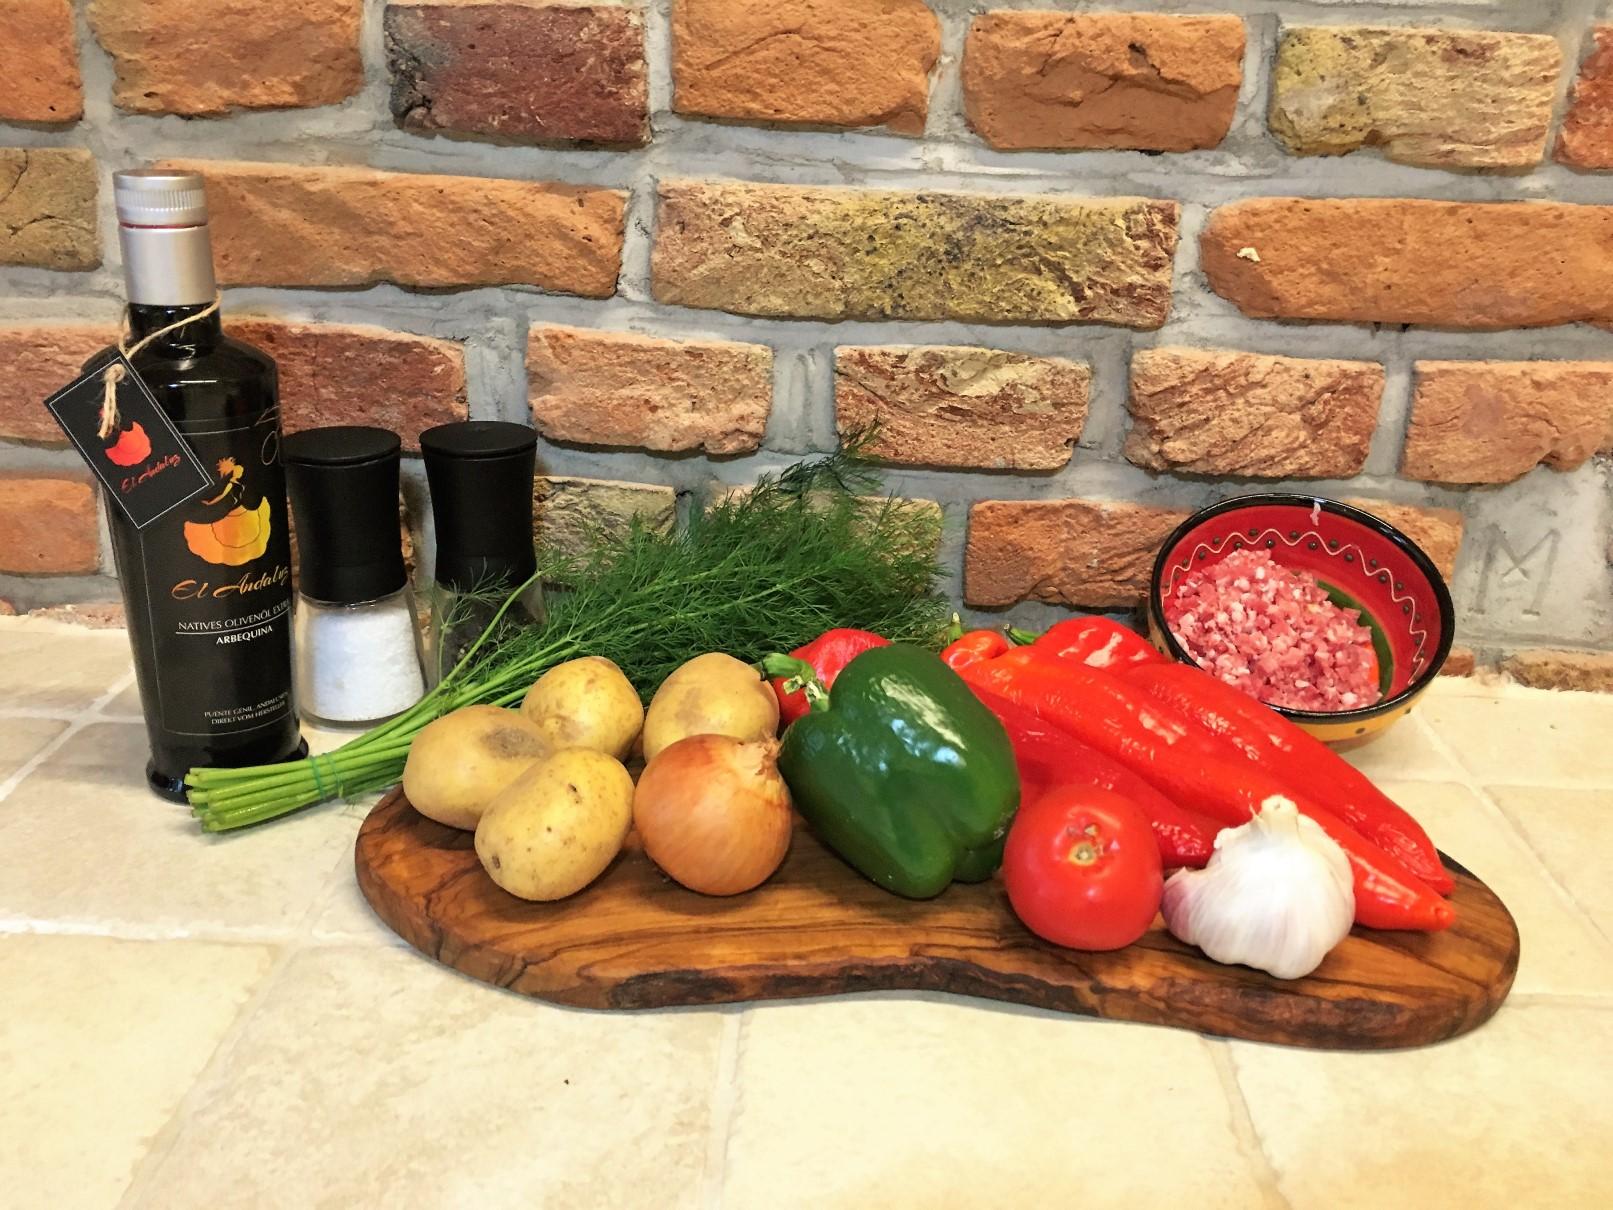 gemuesepfanne-arbequina-olivenoel-zutaten